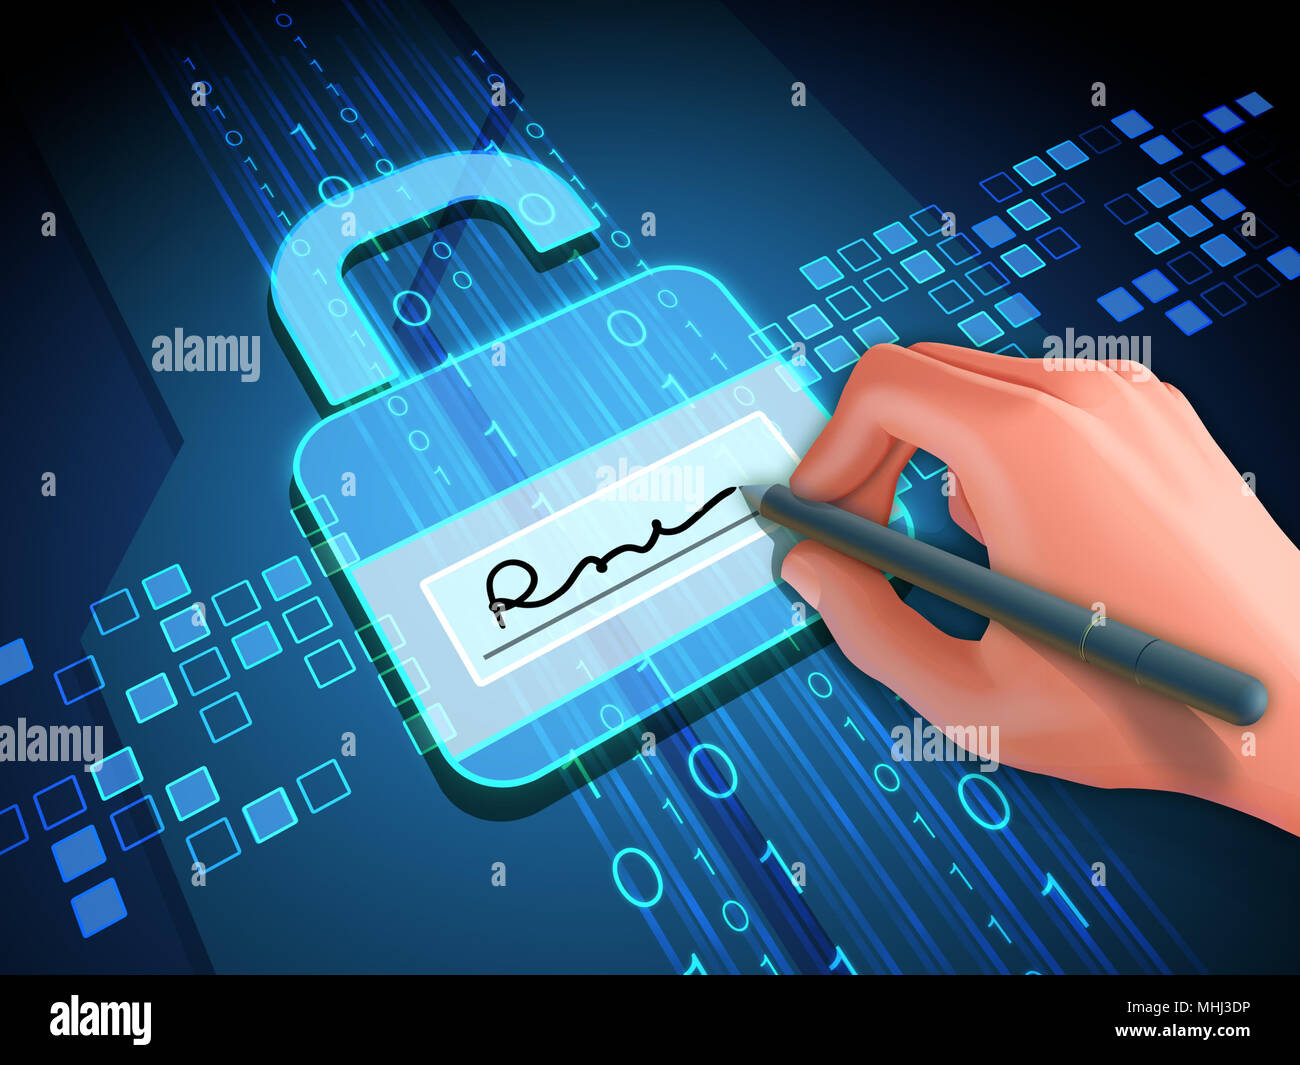 Mobile Security Unlock